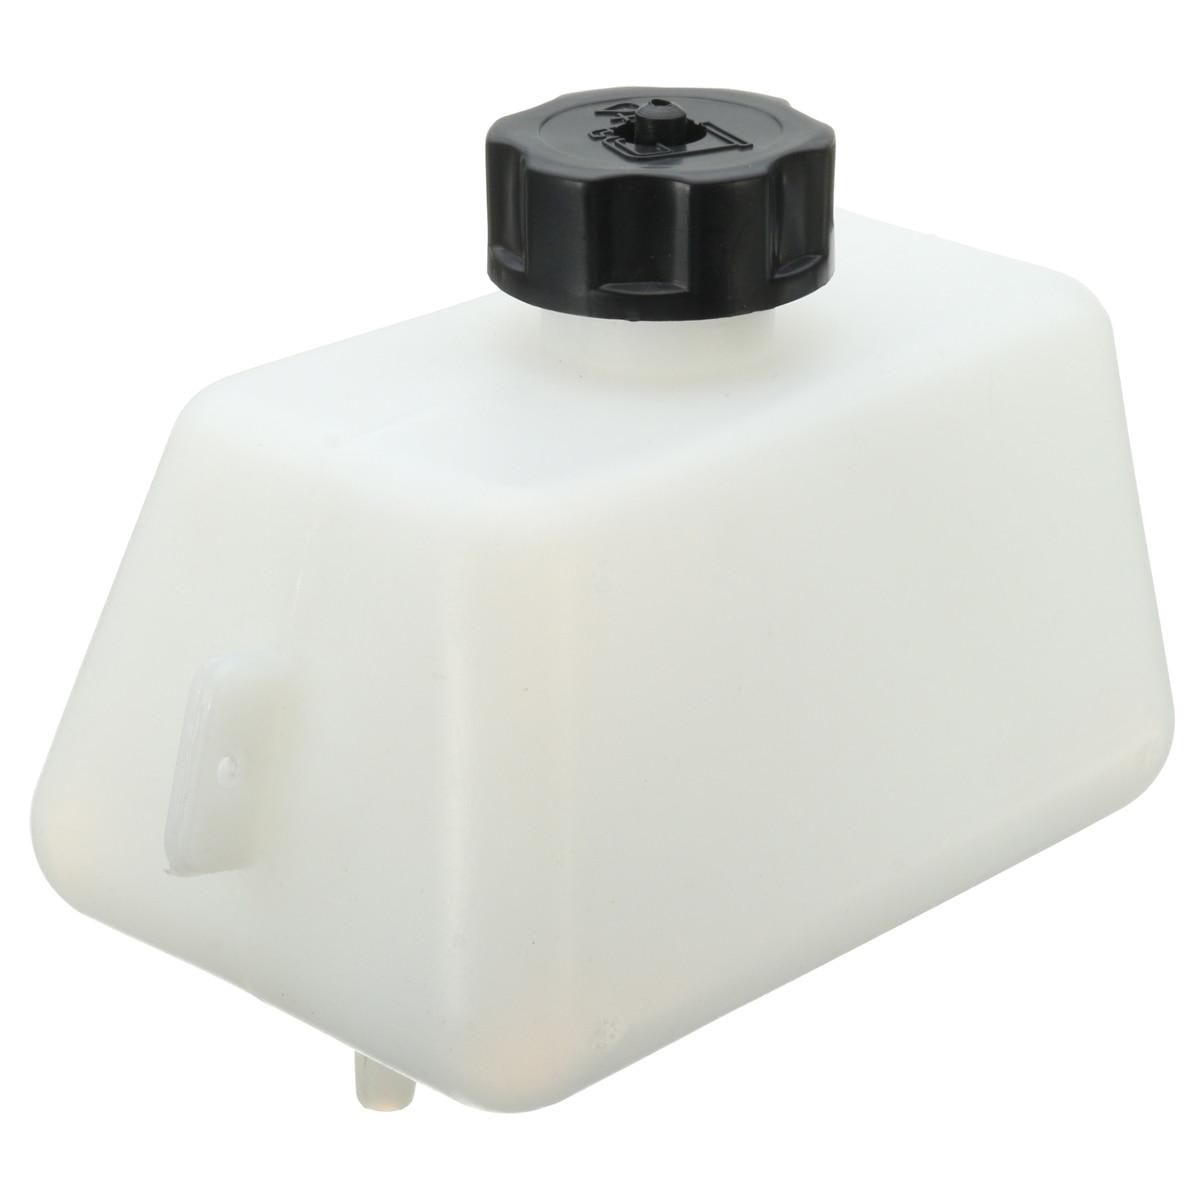 1.5l White Body Black Cap Plastic Motorcycle Petrol Fuel Tank For Mini Moto Pit Dirt Bike Dirtbikes Filter